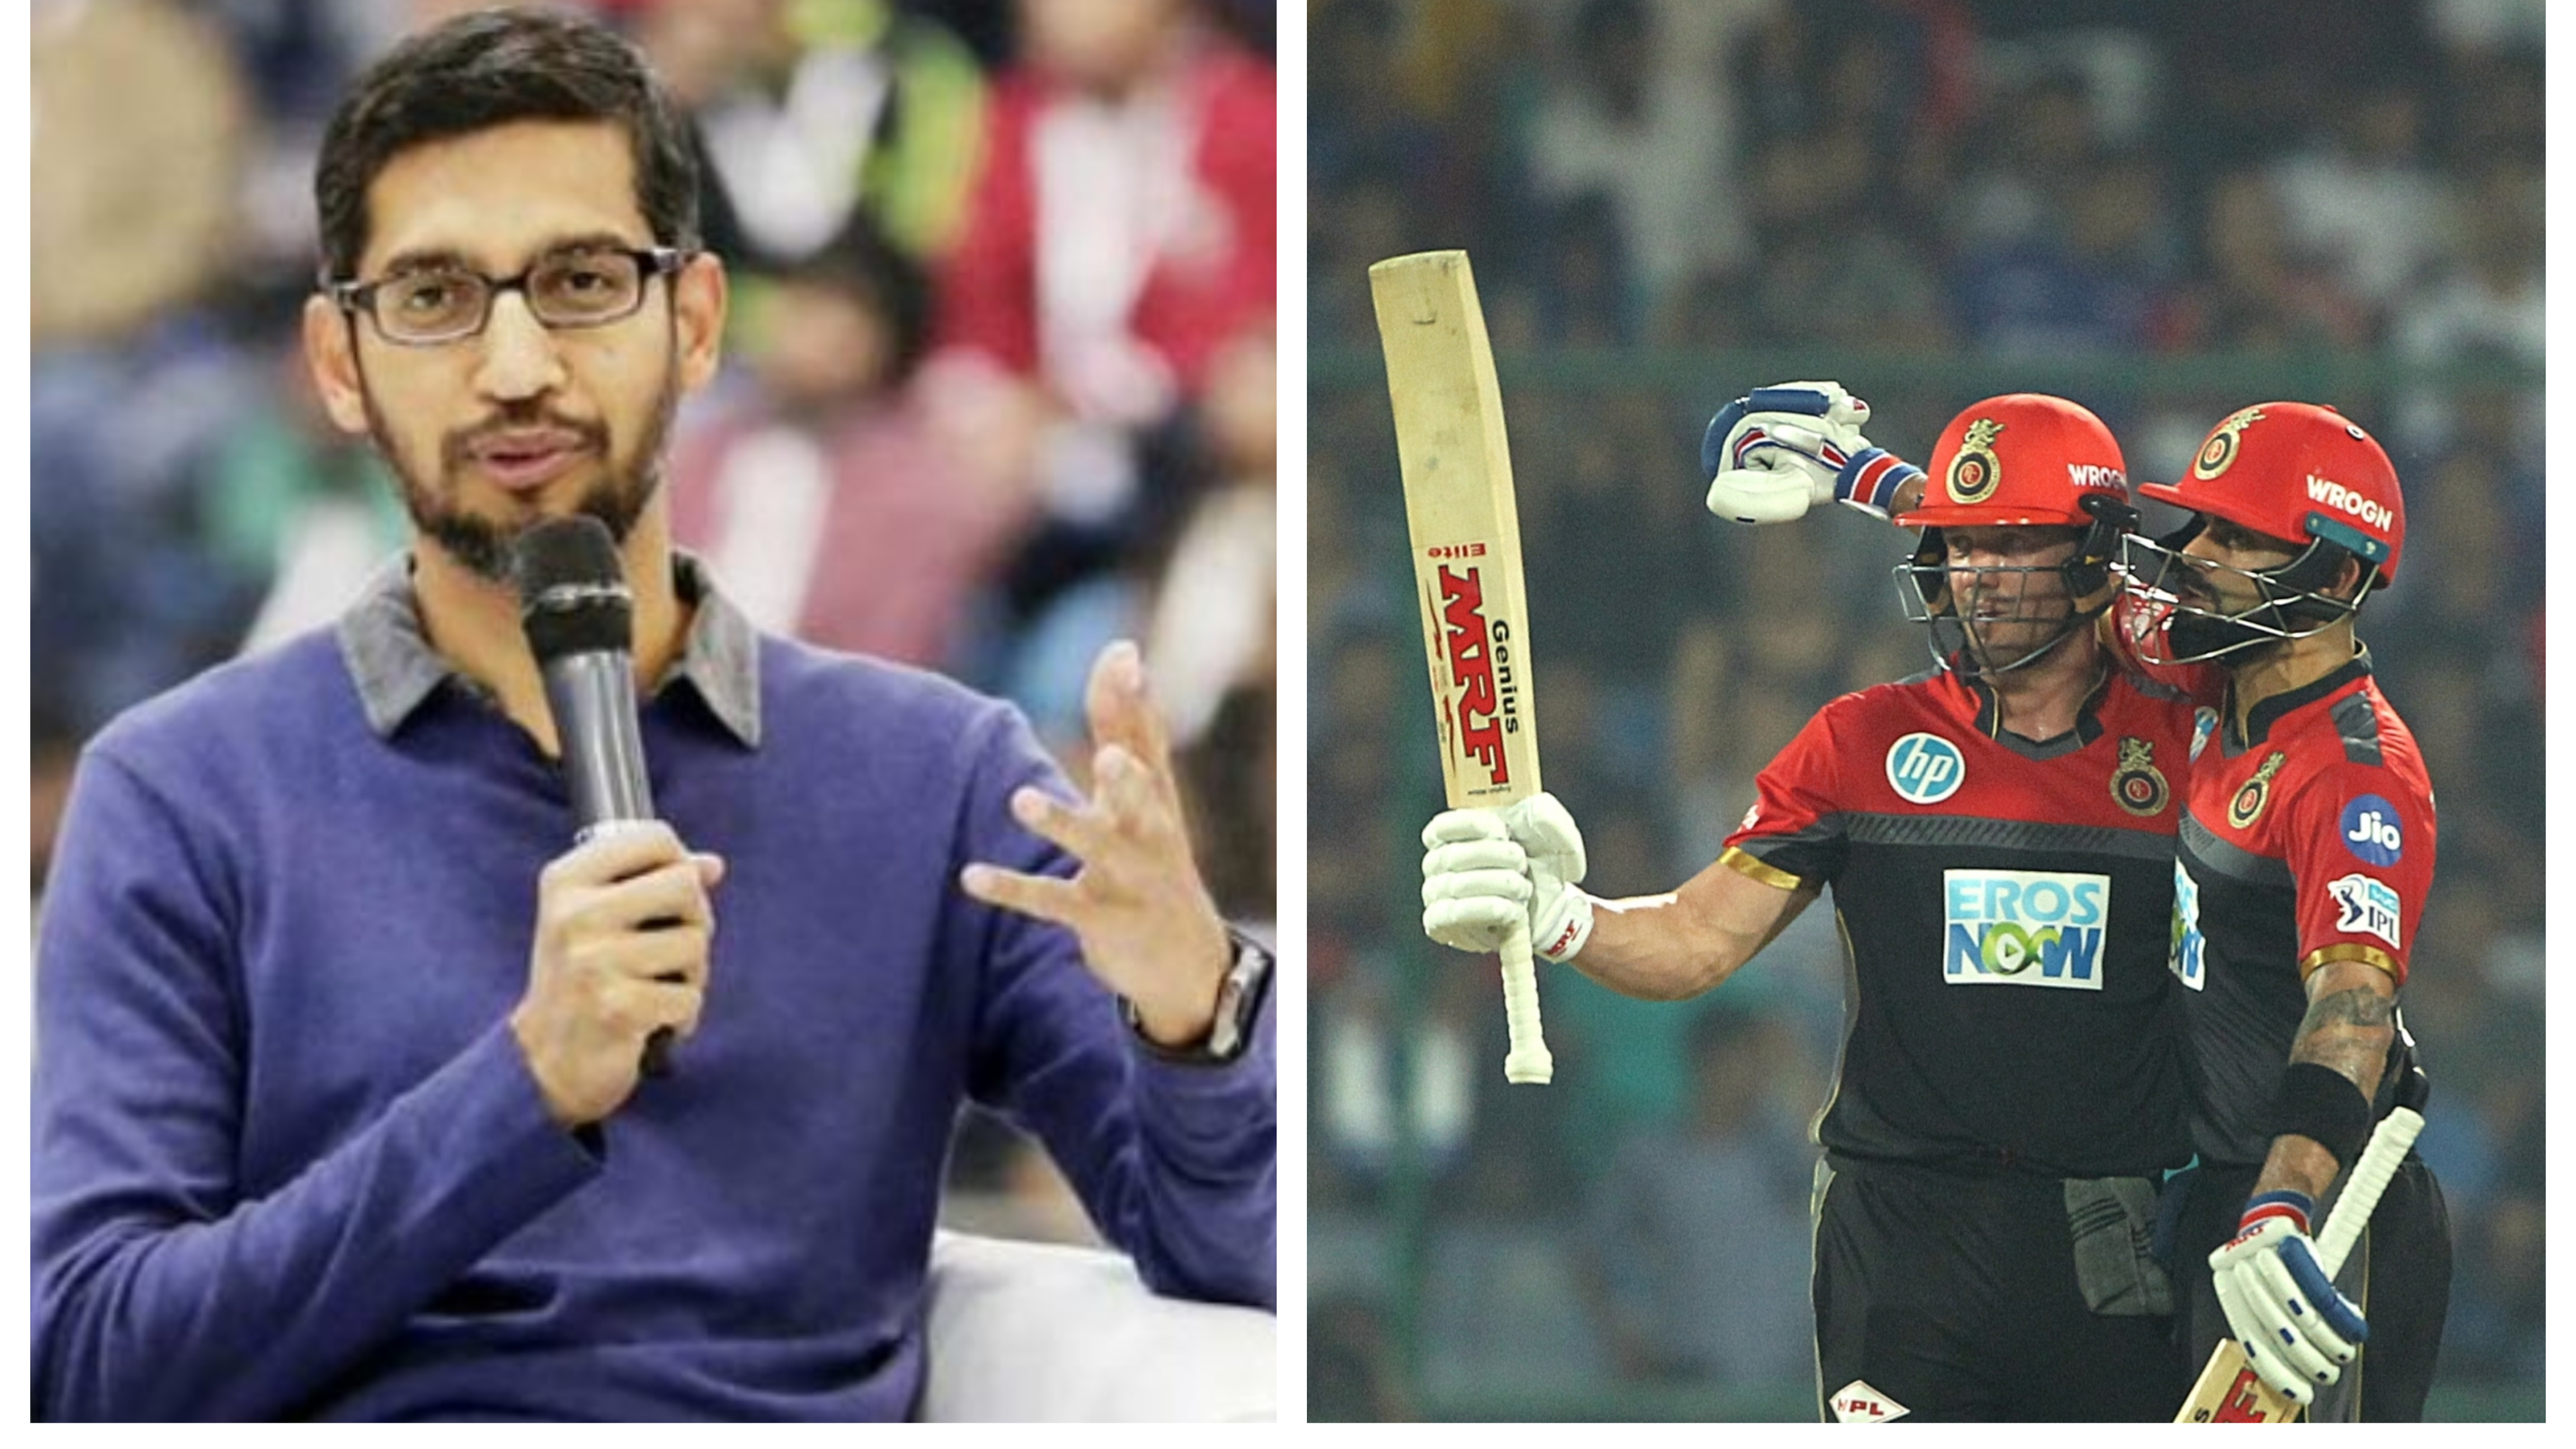 IPL 2018: Google CEO Sundar Pichai mesmerized by Kohli-Devilliers batting exhibition against Delhi Daredevils